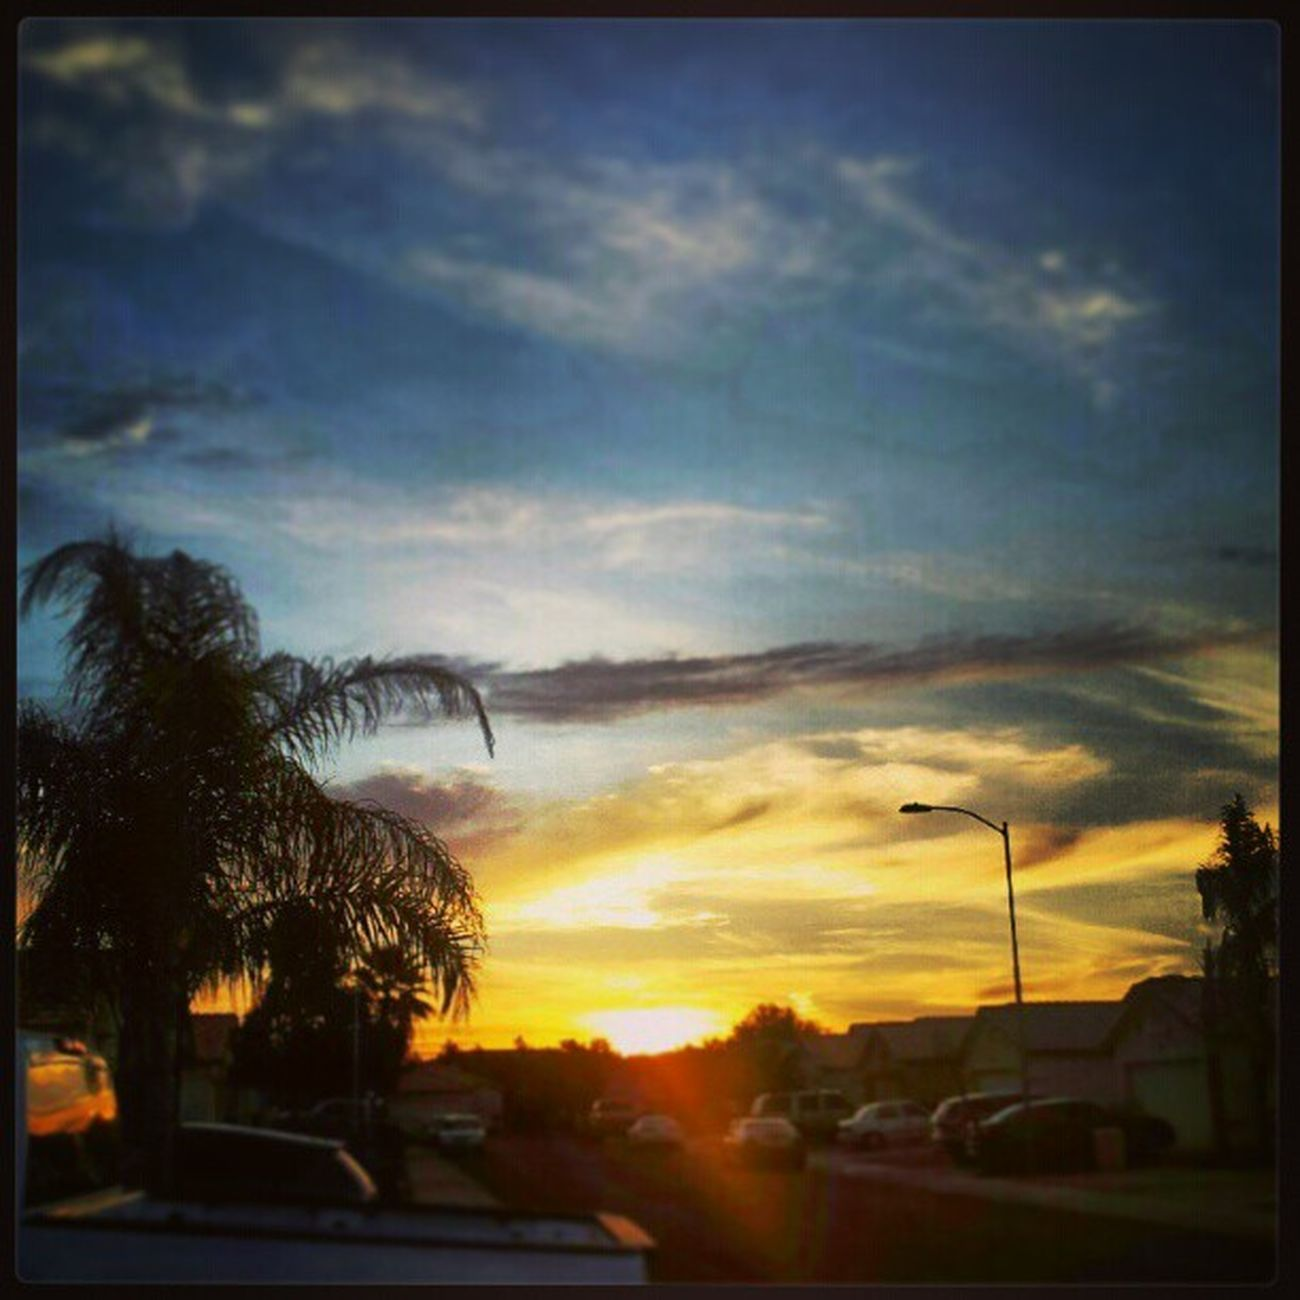 Instagramaz Glendaleaz Desertlivin Horizon Blueskies Clouds Palmtrees Sunrise @arizonaskies Sunrisegram Colorful Cloudydays Cloudporn Beautifulsundaymorning Lensflare Lightpole Natureisprettycool @____sun_rise_earth_____ @ibeautyofnature